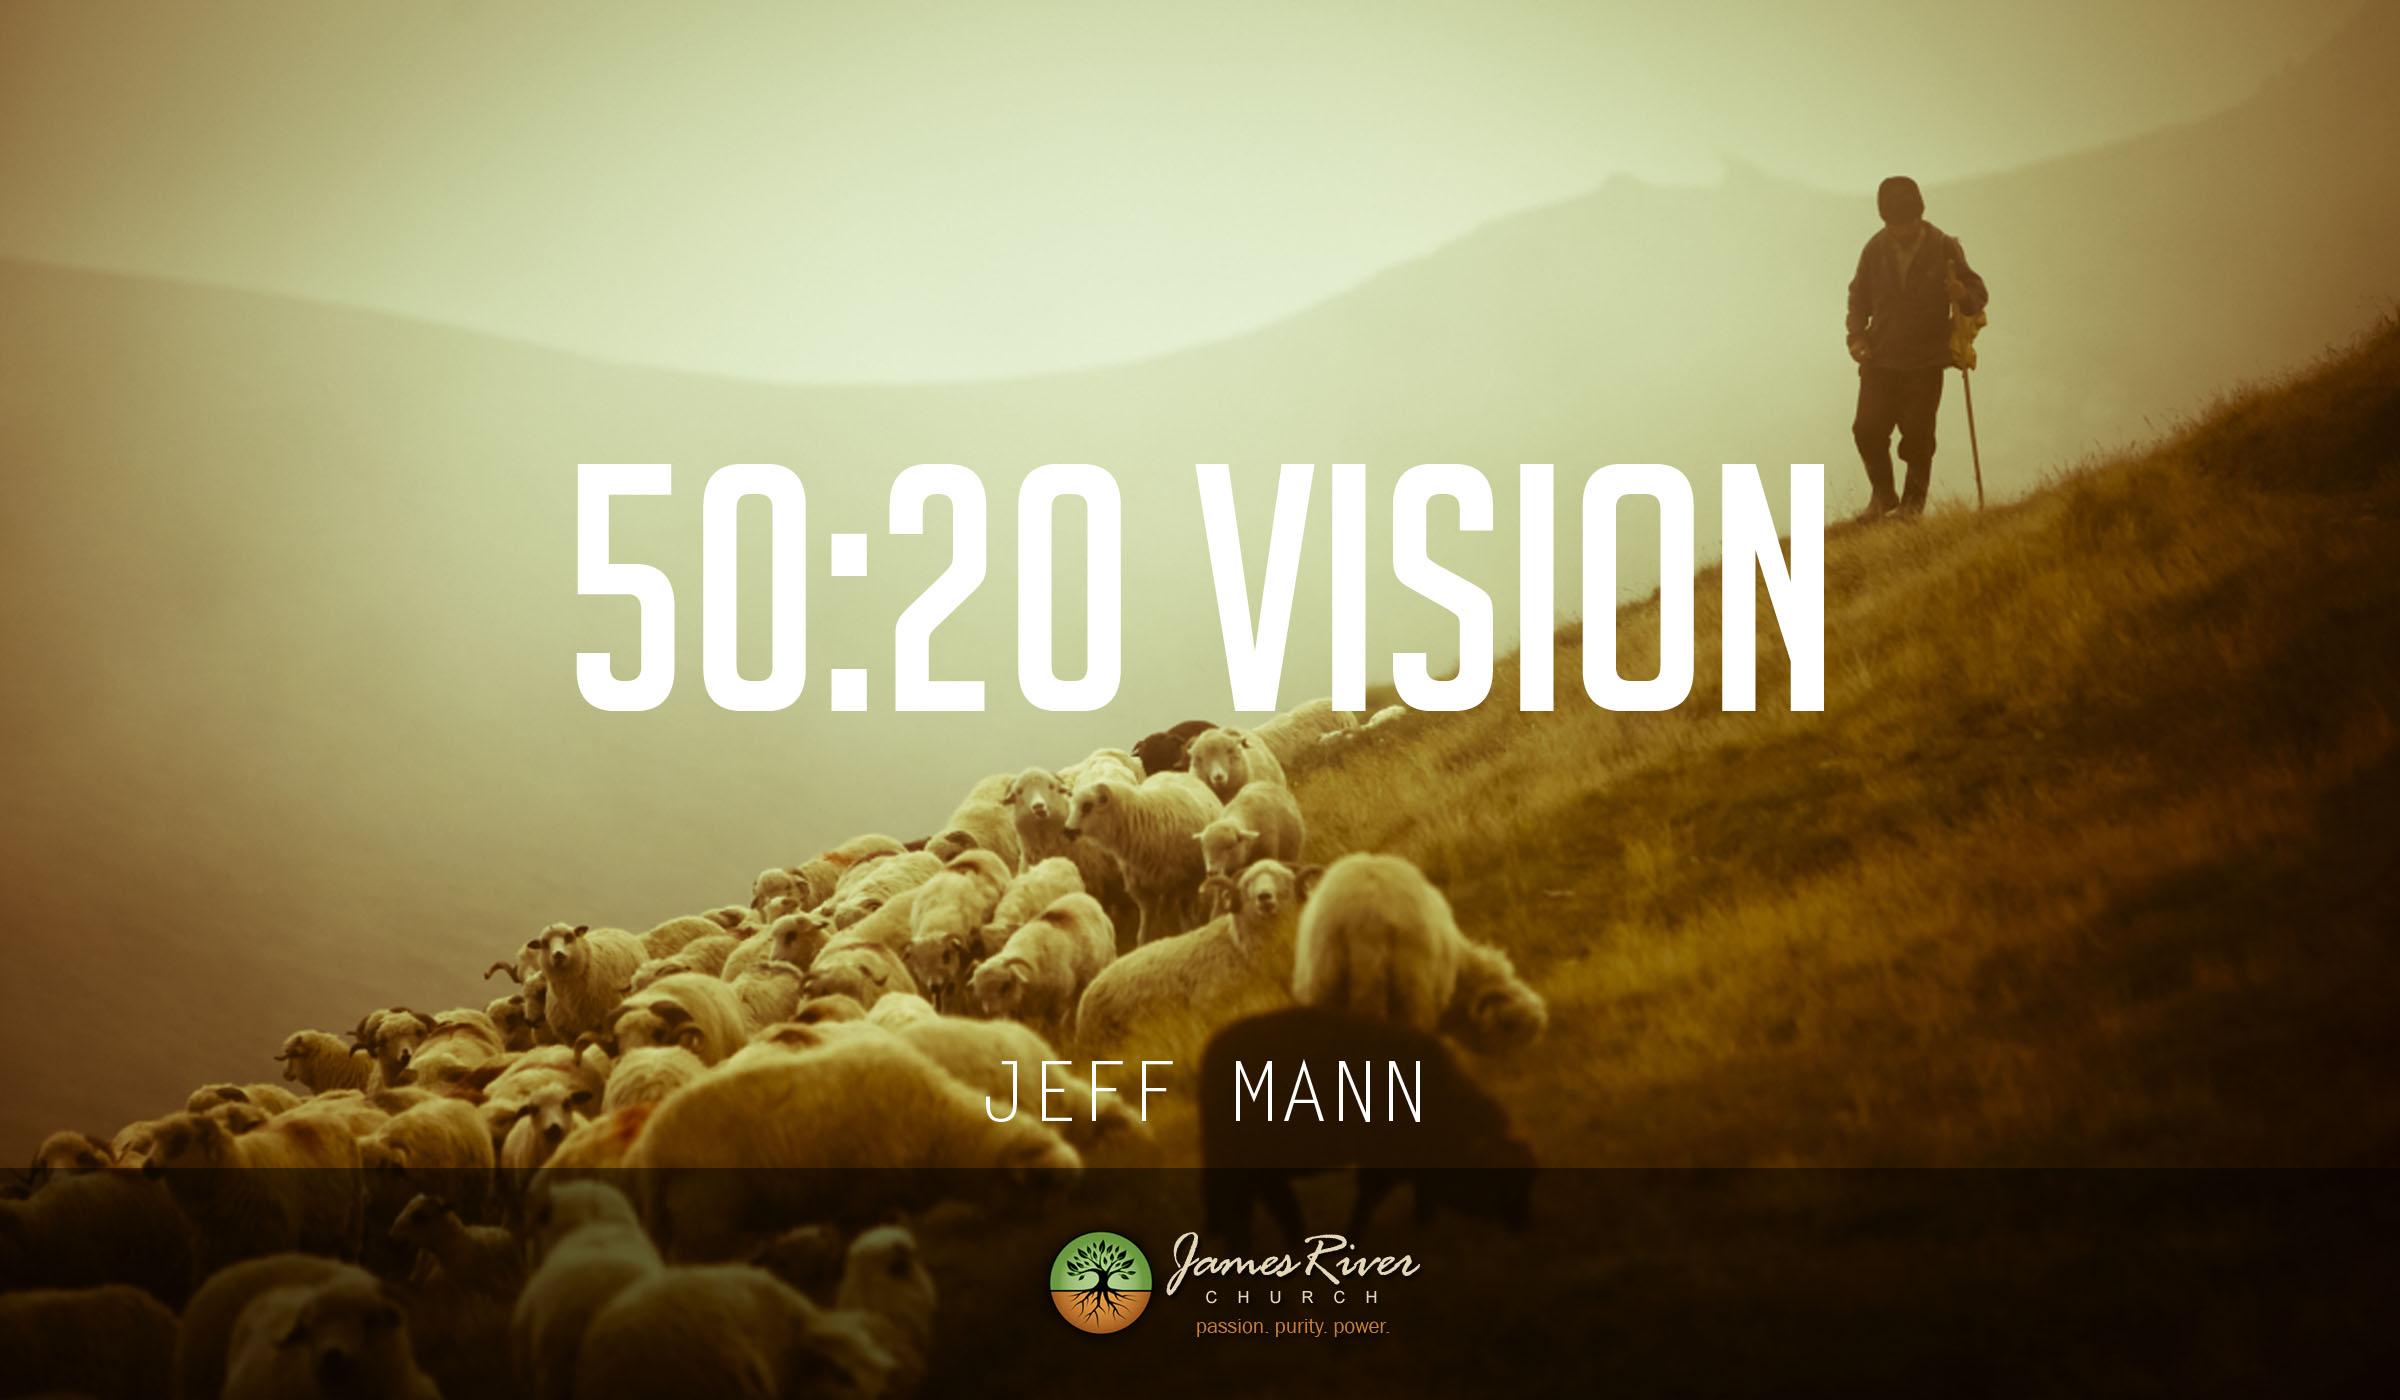 50:20 Vision